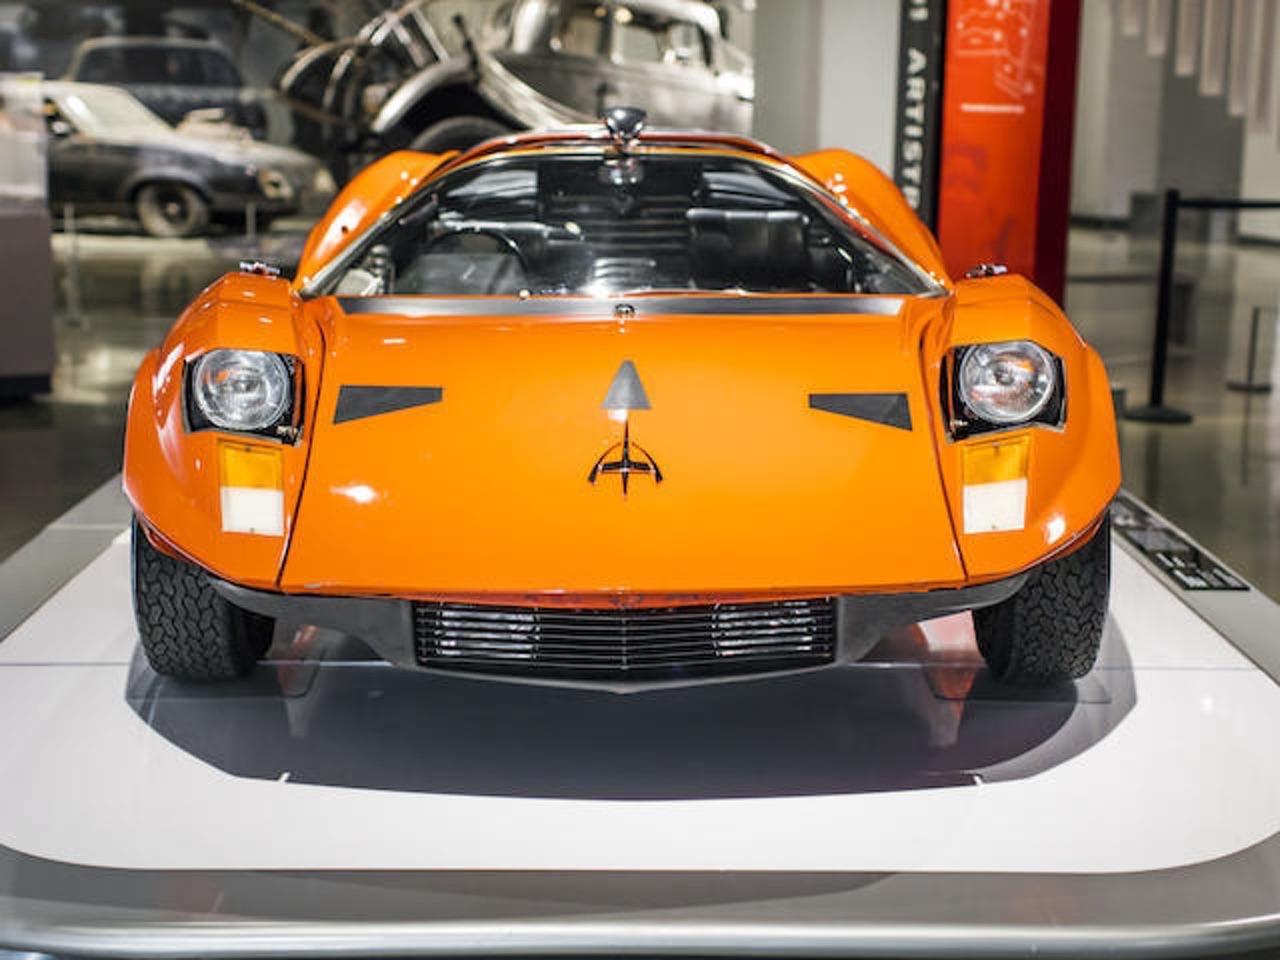 '69 Adams Brothers Probe 16... Orange mécanique ! 1